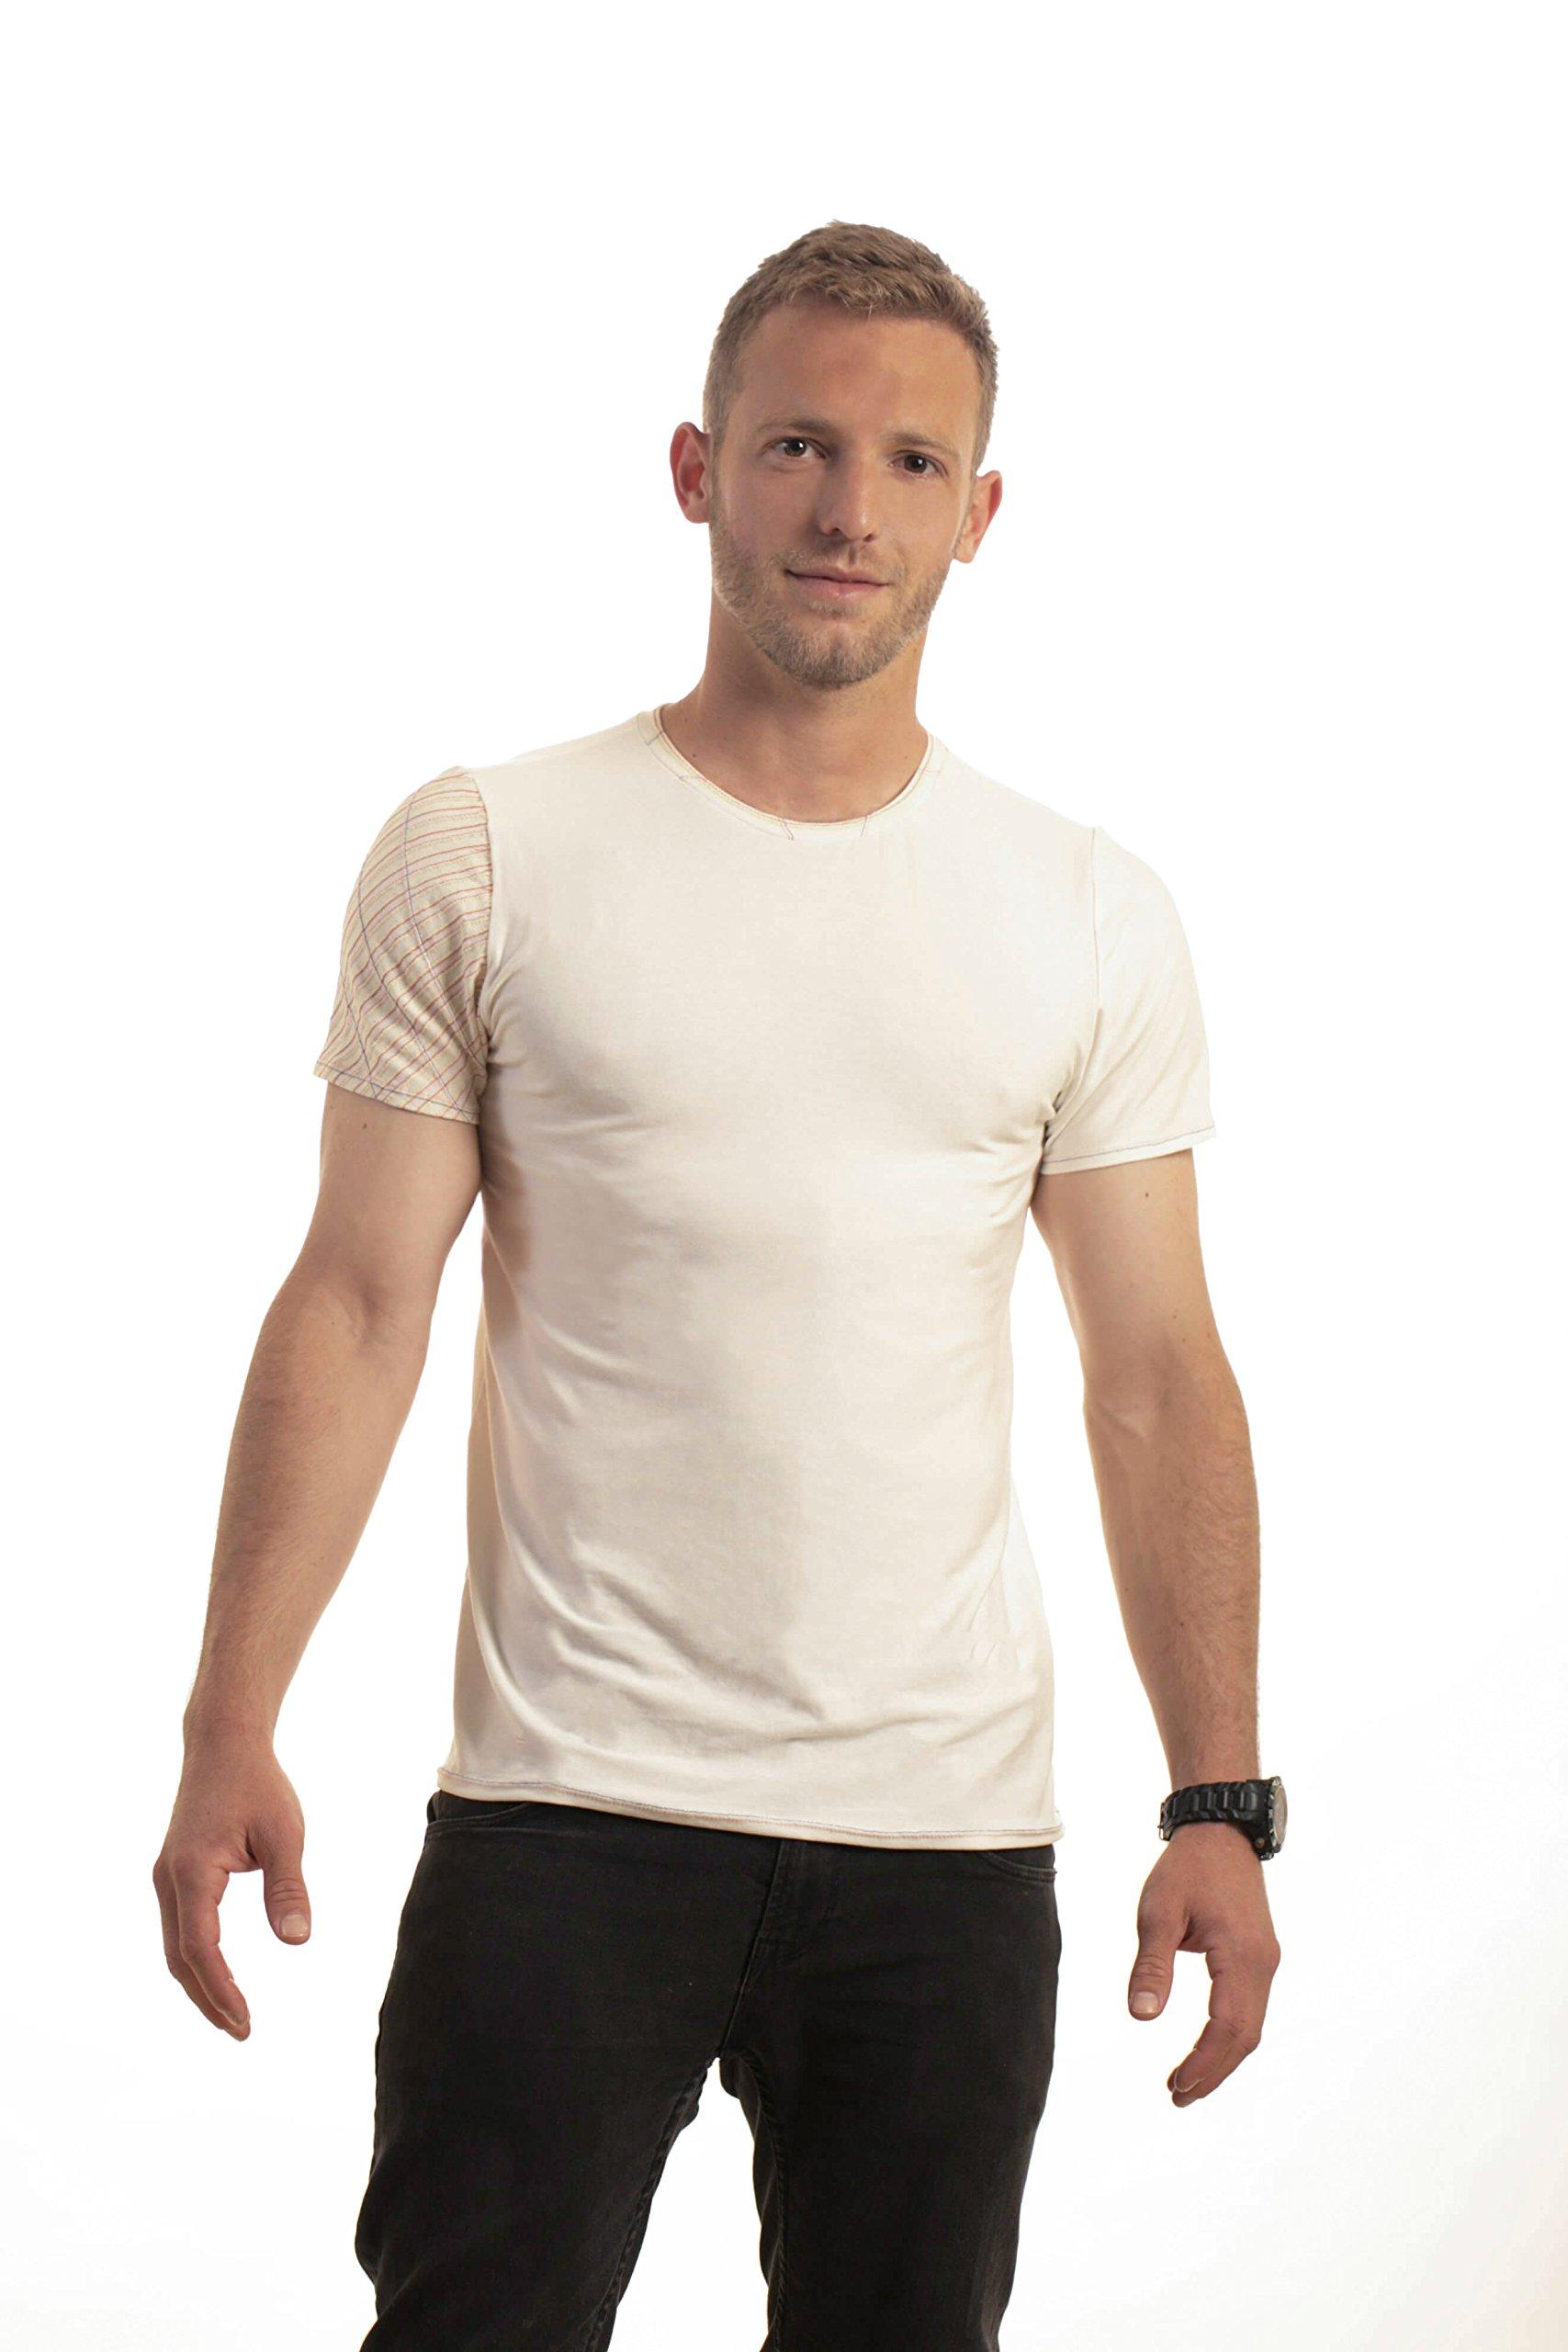 Handmade shirt, Mens White Shirt, Mans T-shirt, Design tshirt, Mens clothing, Man's Top, Unique shirt, Men's Clothing, mens fashion clothing